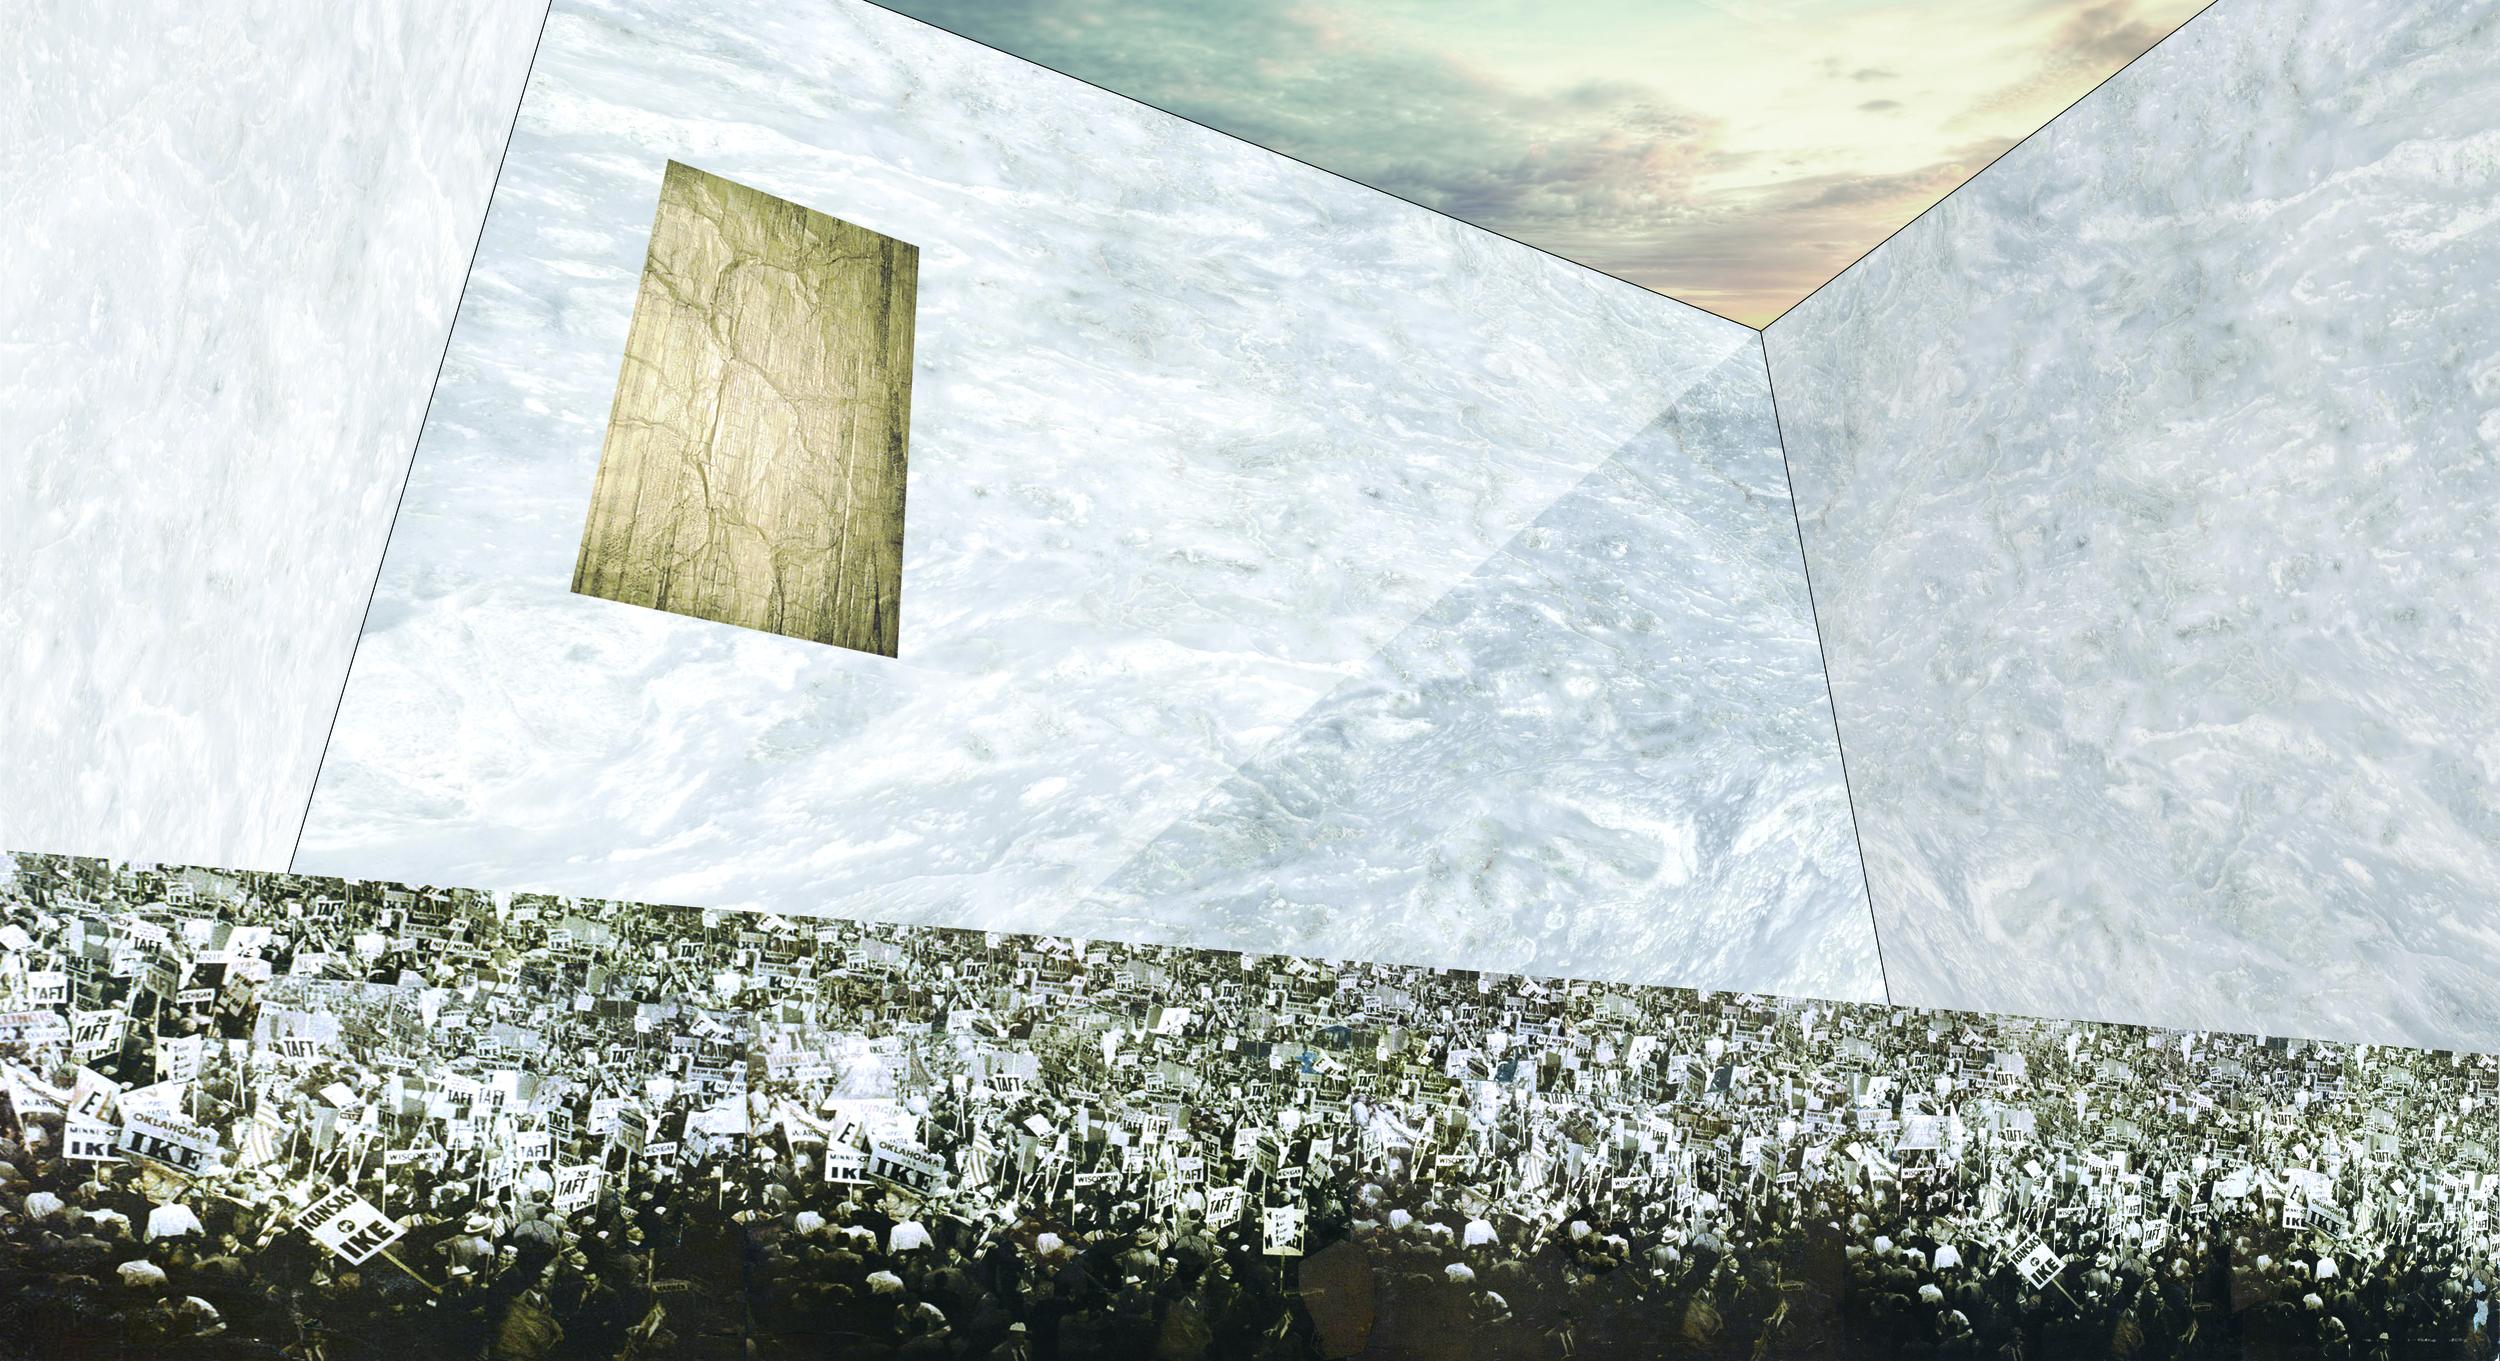 20140831_interior_perspective_04.jpg